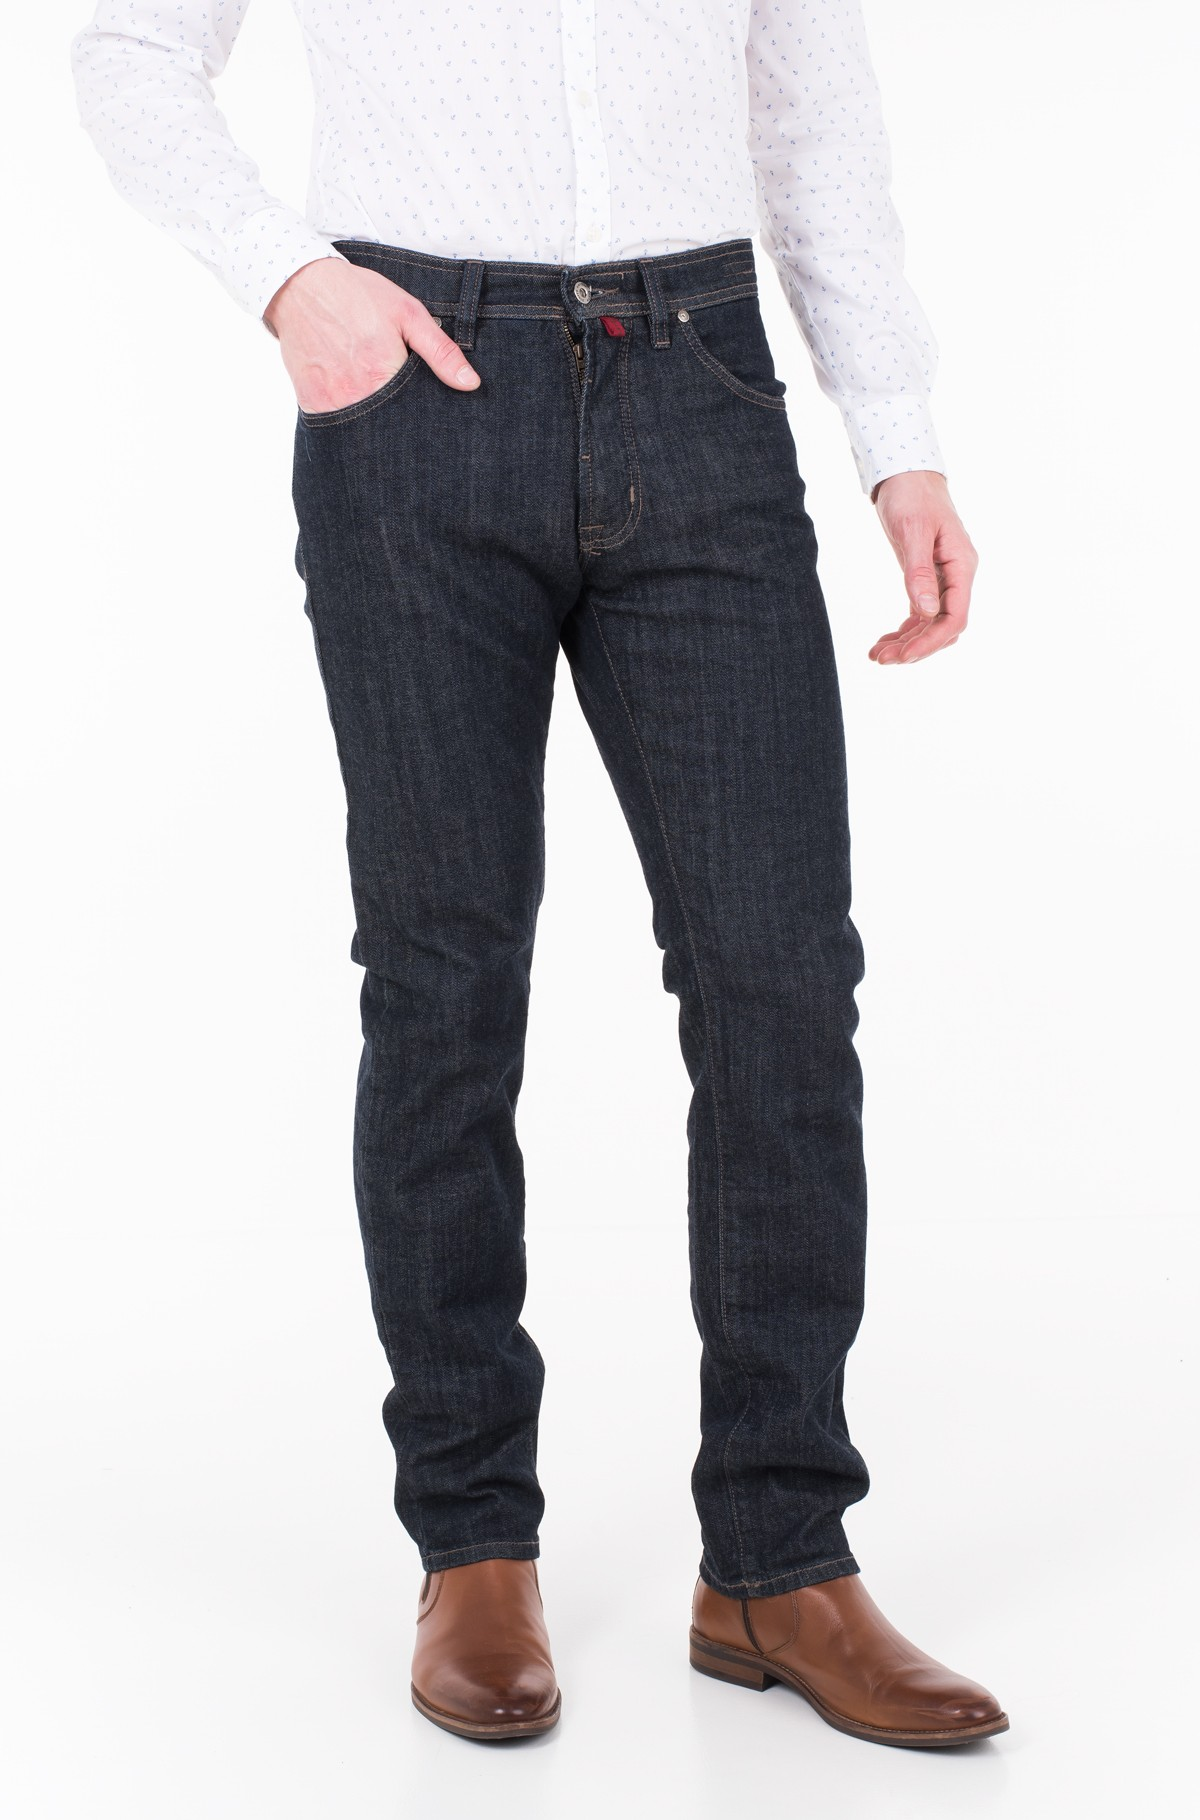 Džinsinės kelnės Deauville 3196-full-1